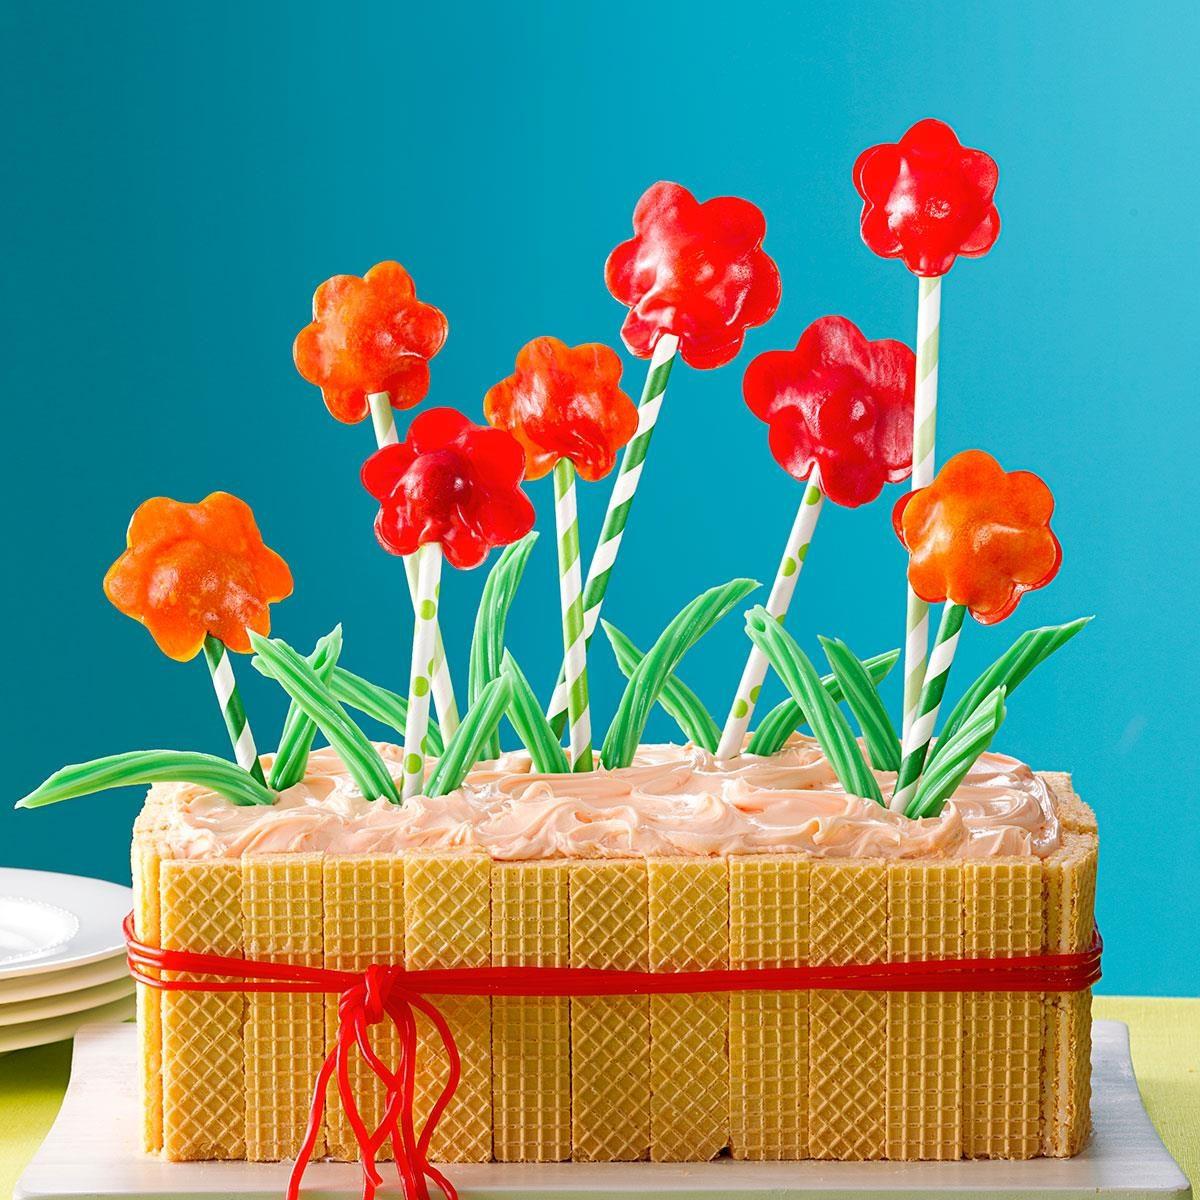 Home Cake Decorating: Sunshine Cake Recipe